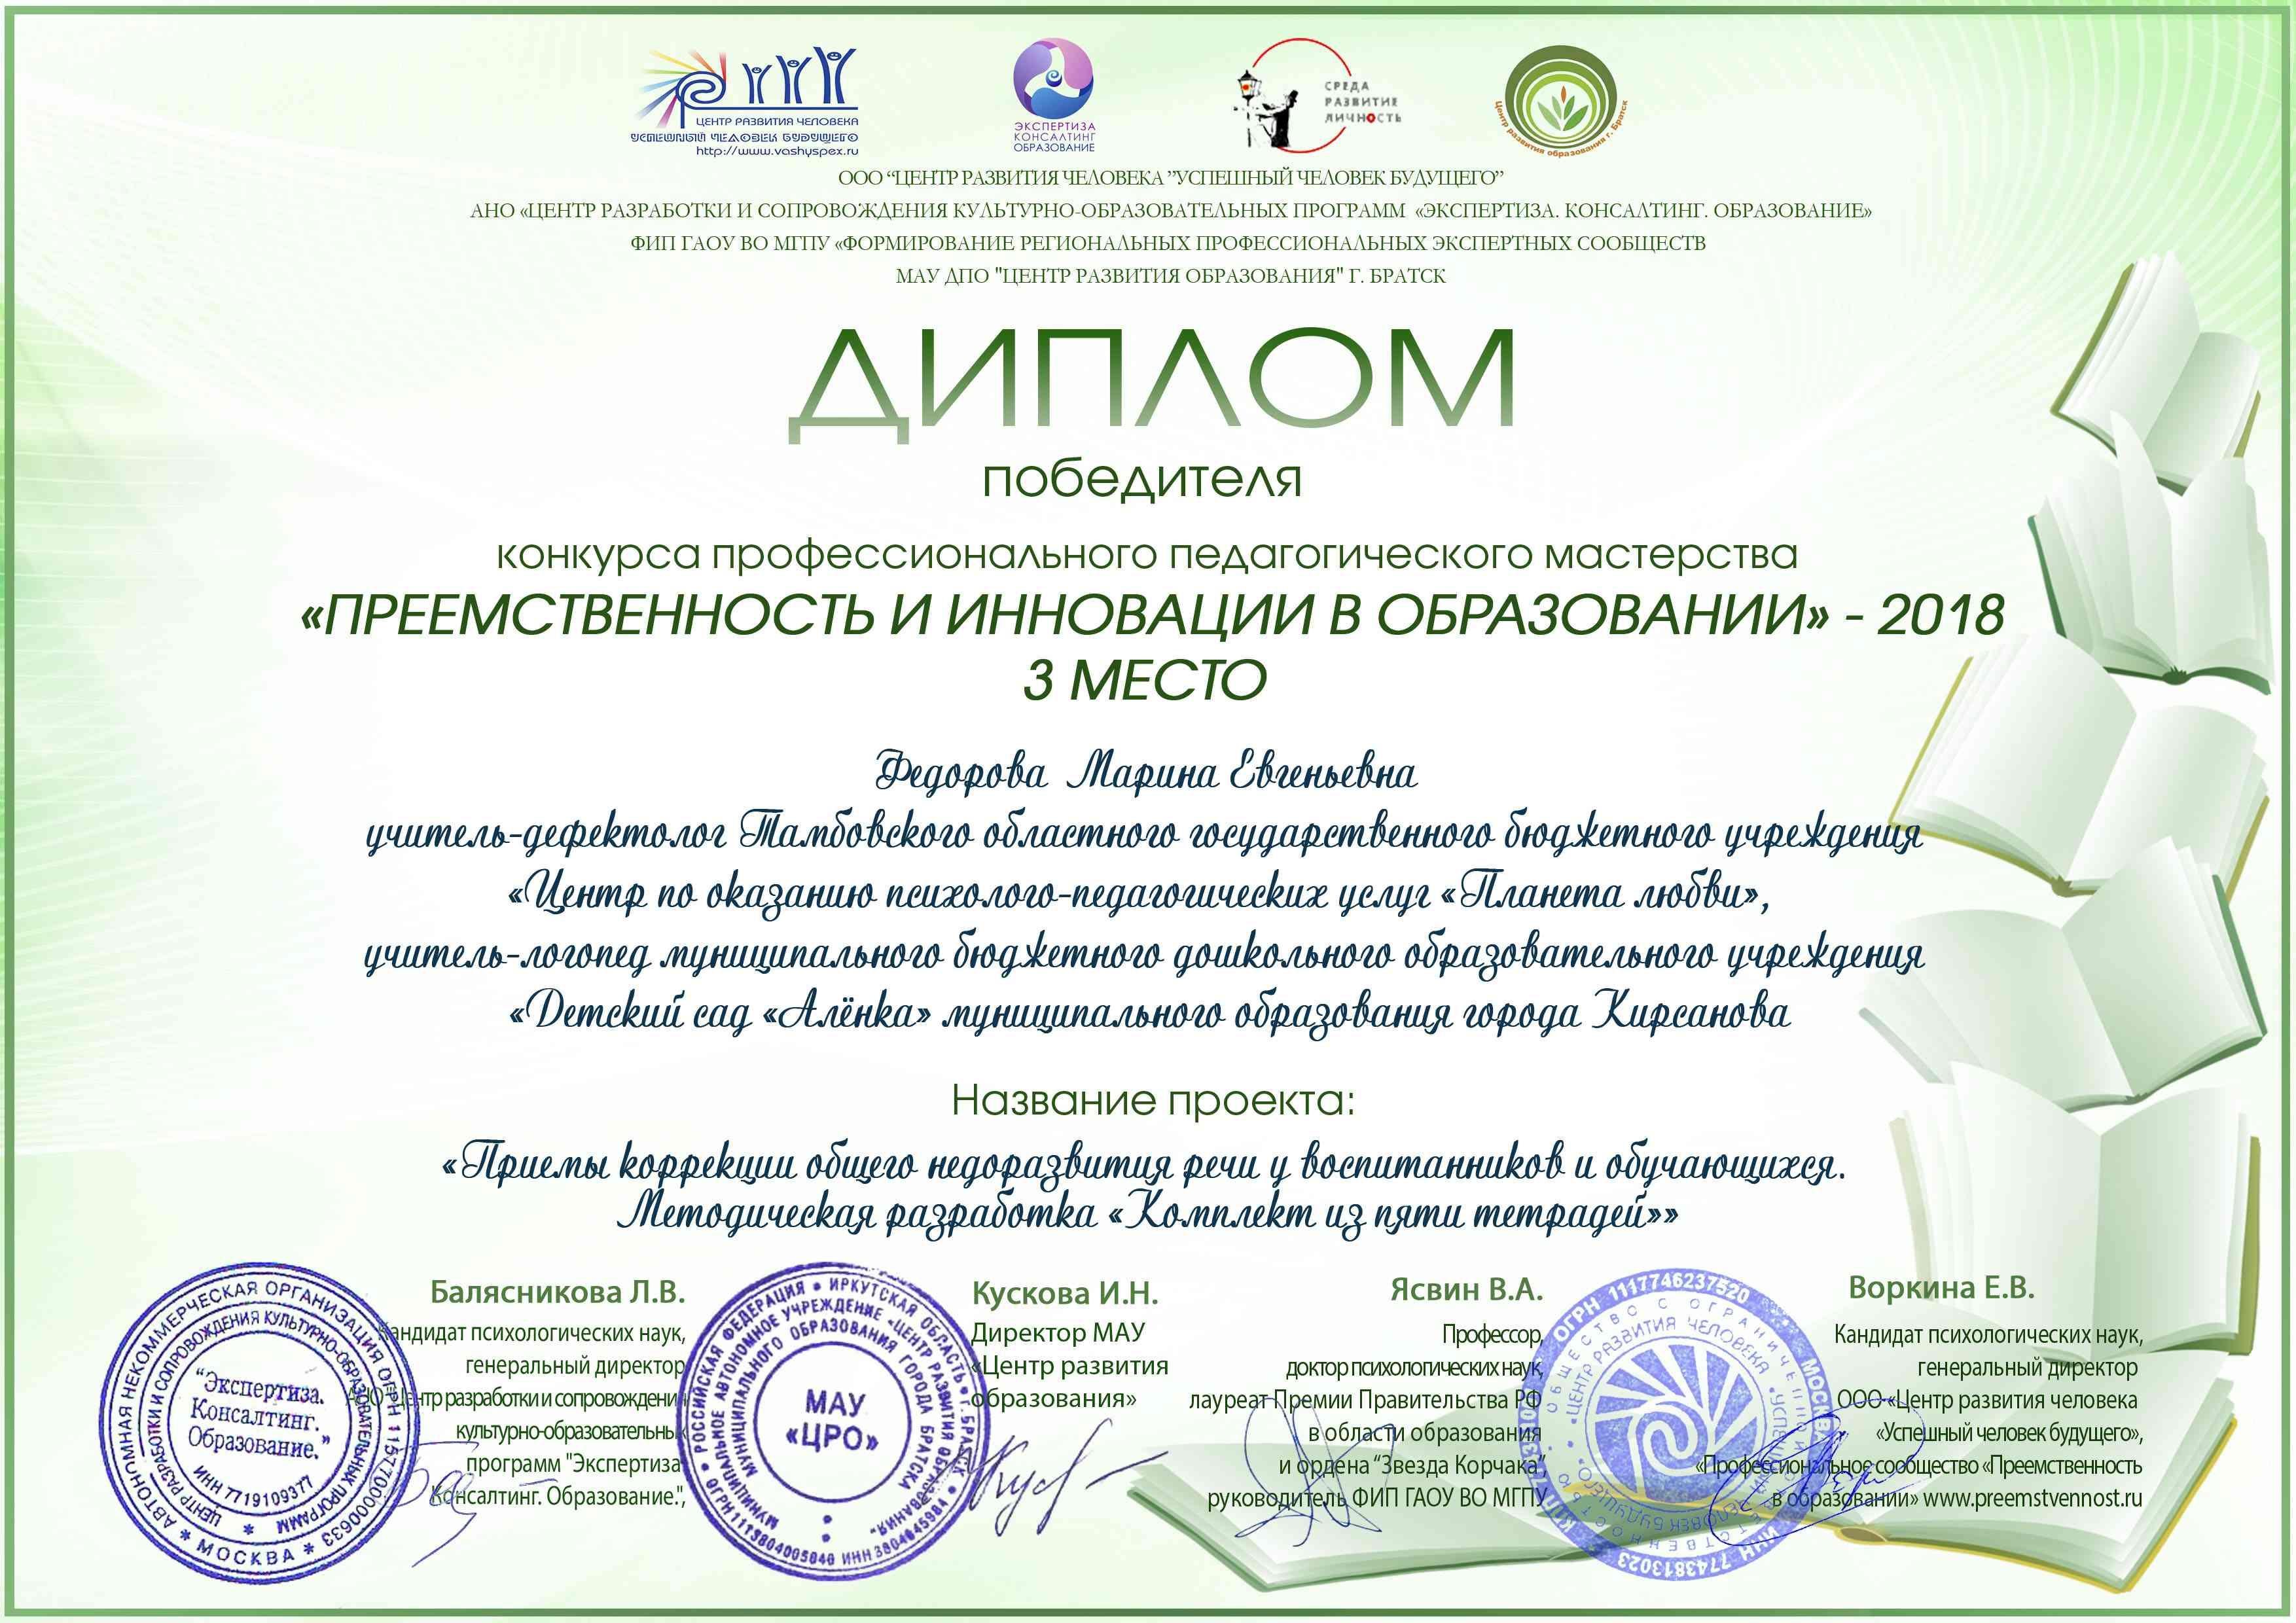 Федорова Марина Евгеньевна 3 место